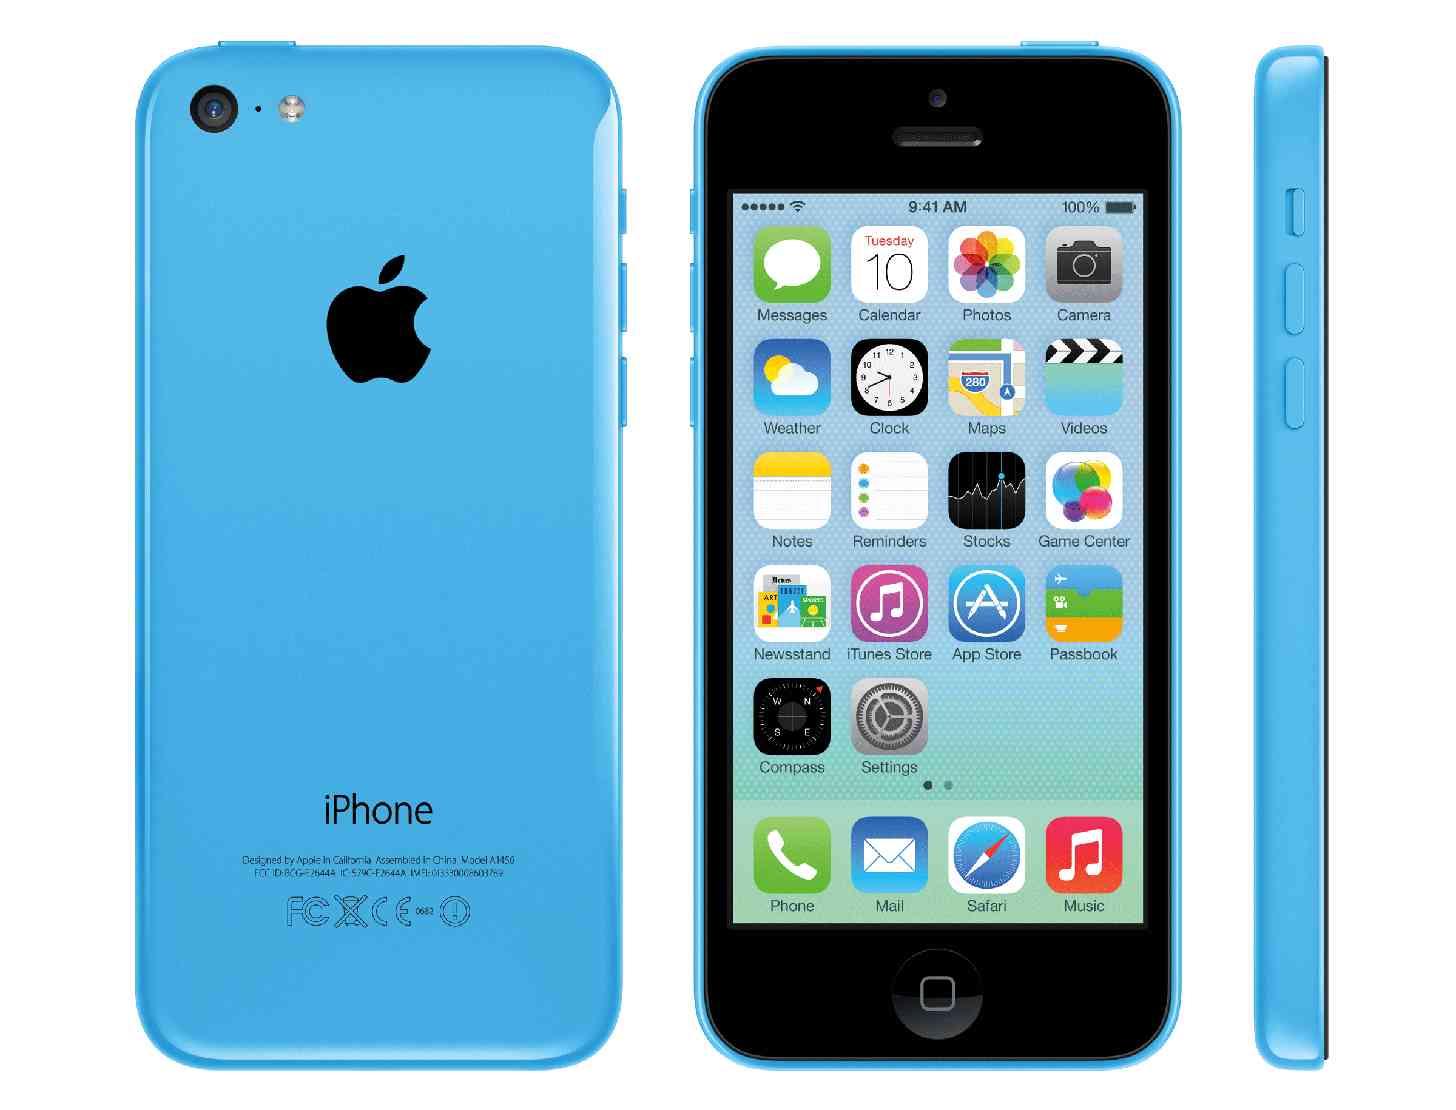 Apple iPhone 5c blue large